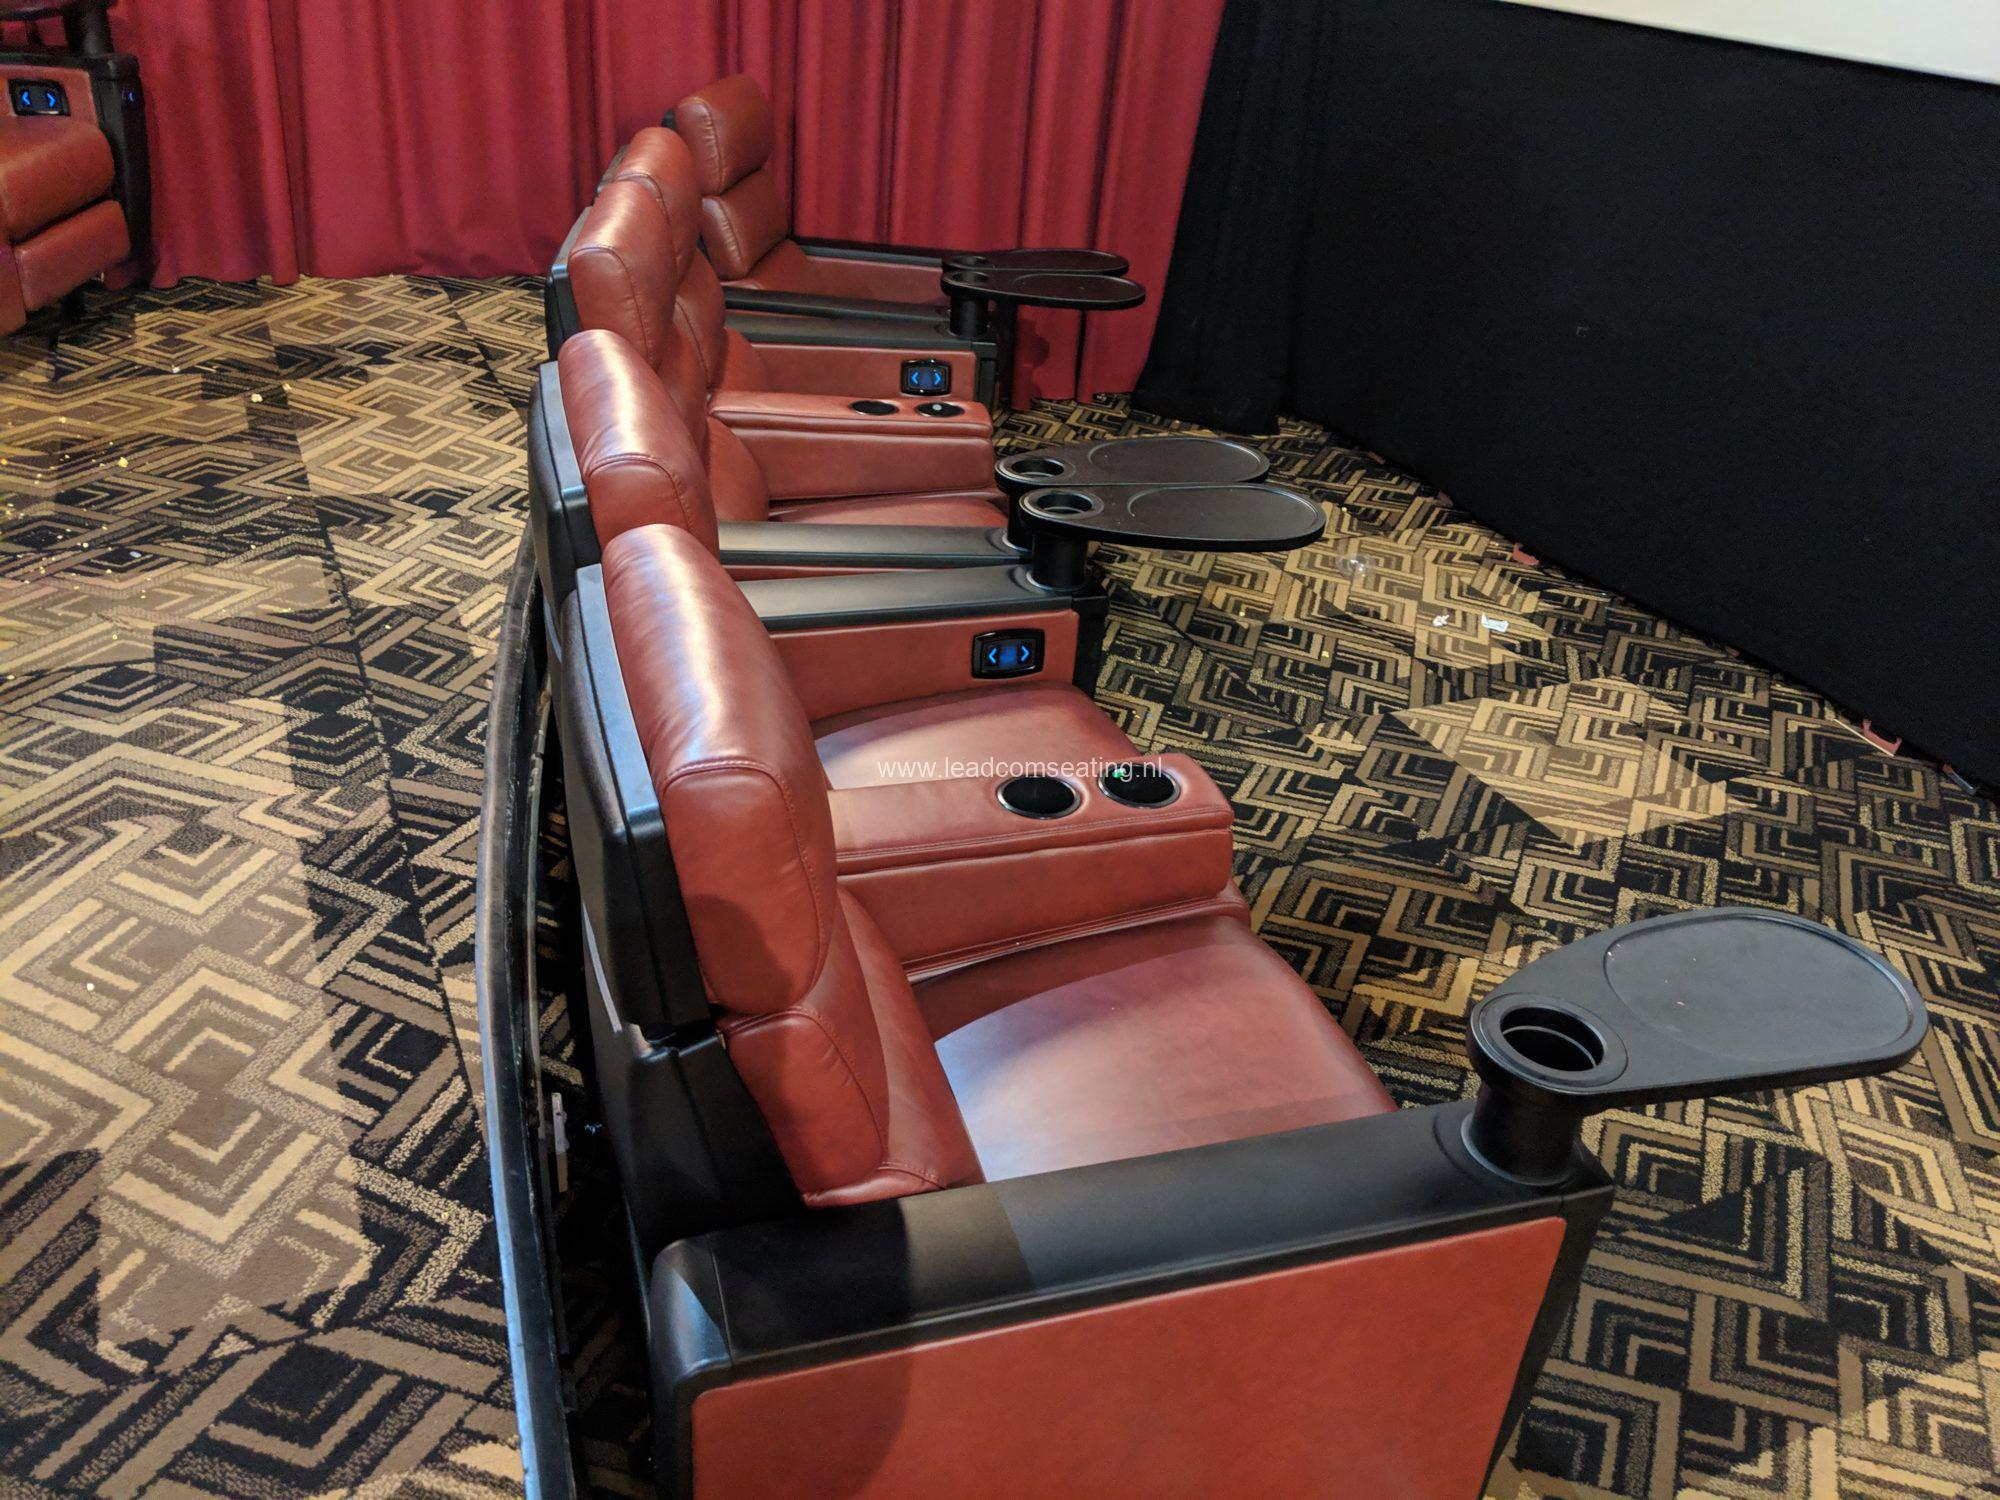 Redbank-cinema-new-wall-hugger-chair-1-1